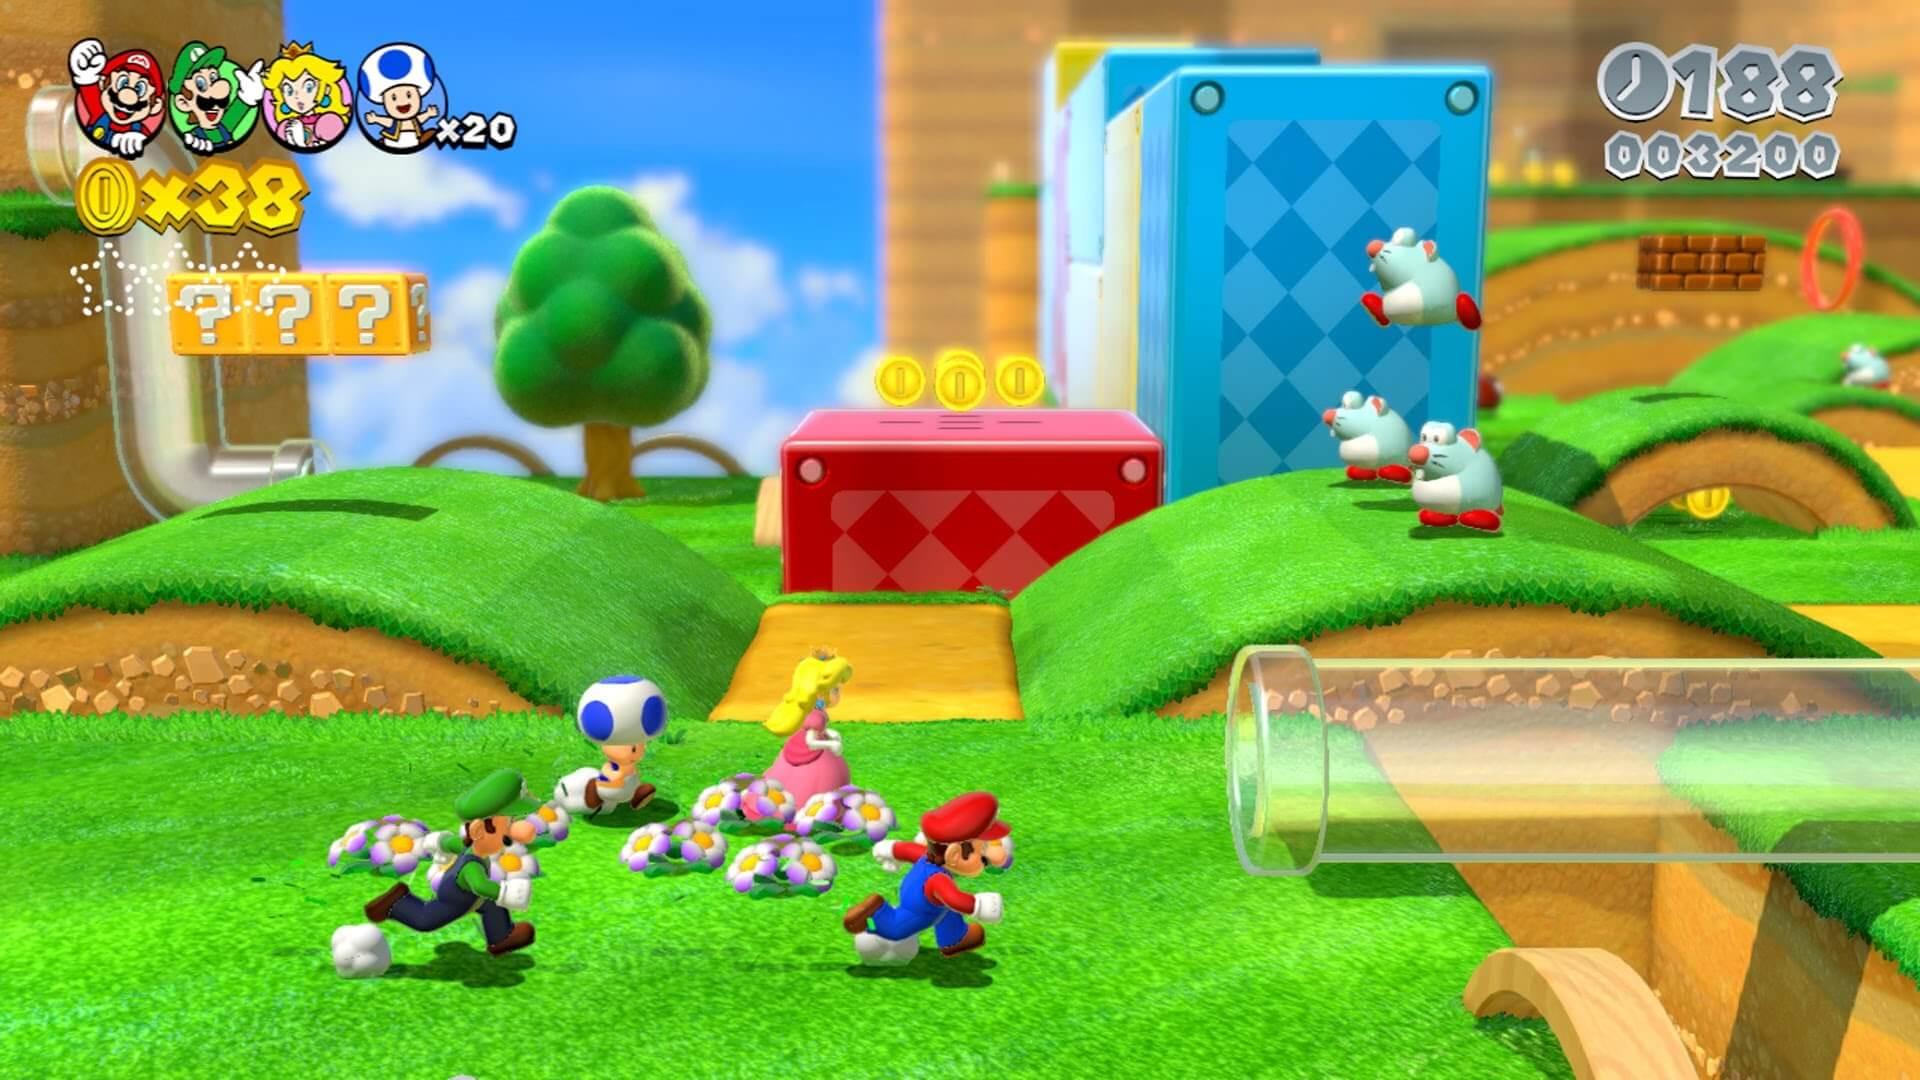 Super Mario 3D World dátum vydania